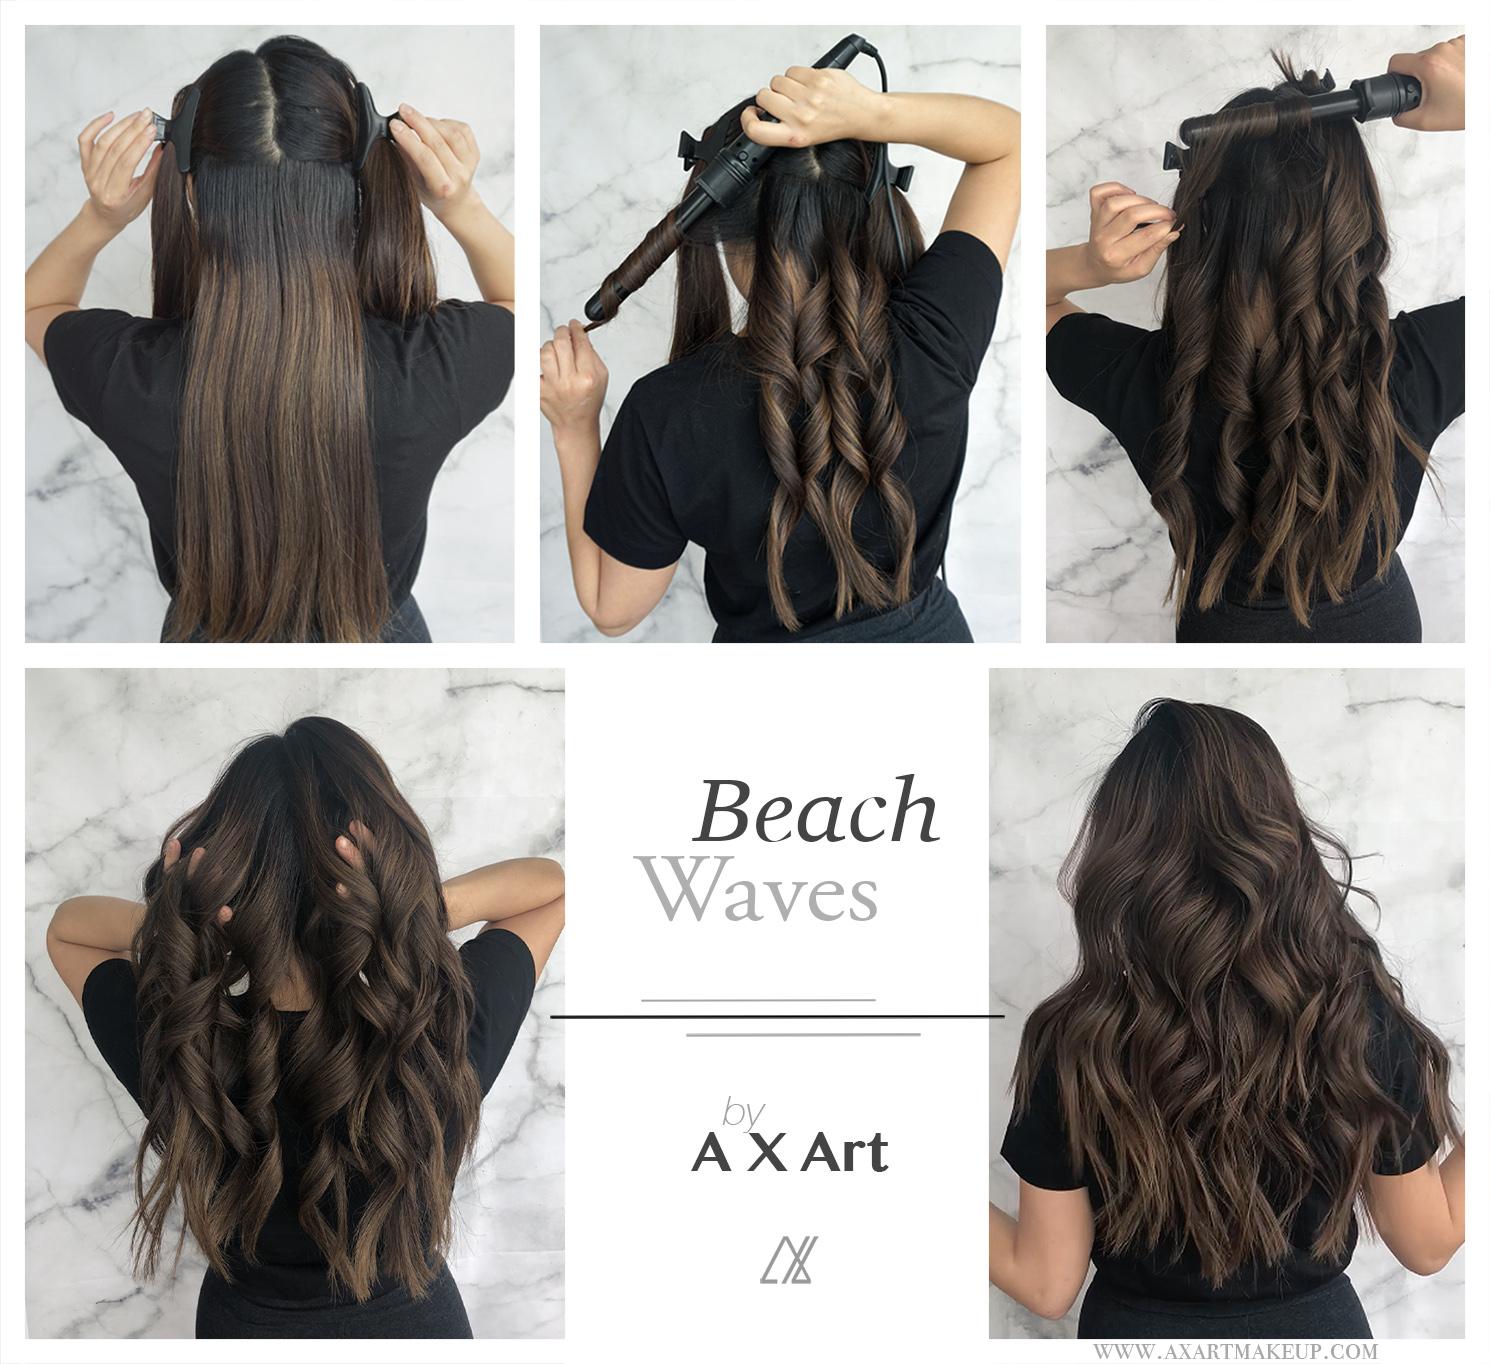 ILHSxAXArt Article May - Beach Waves.jpg